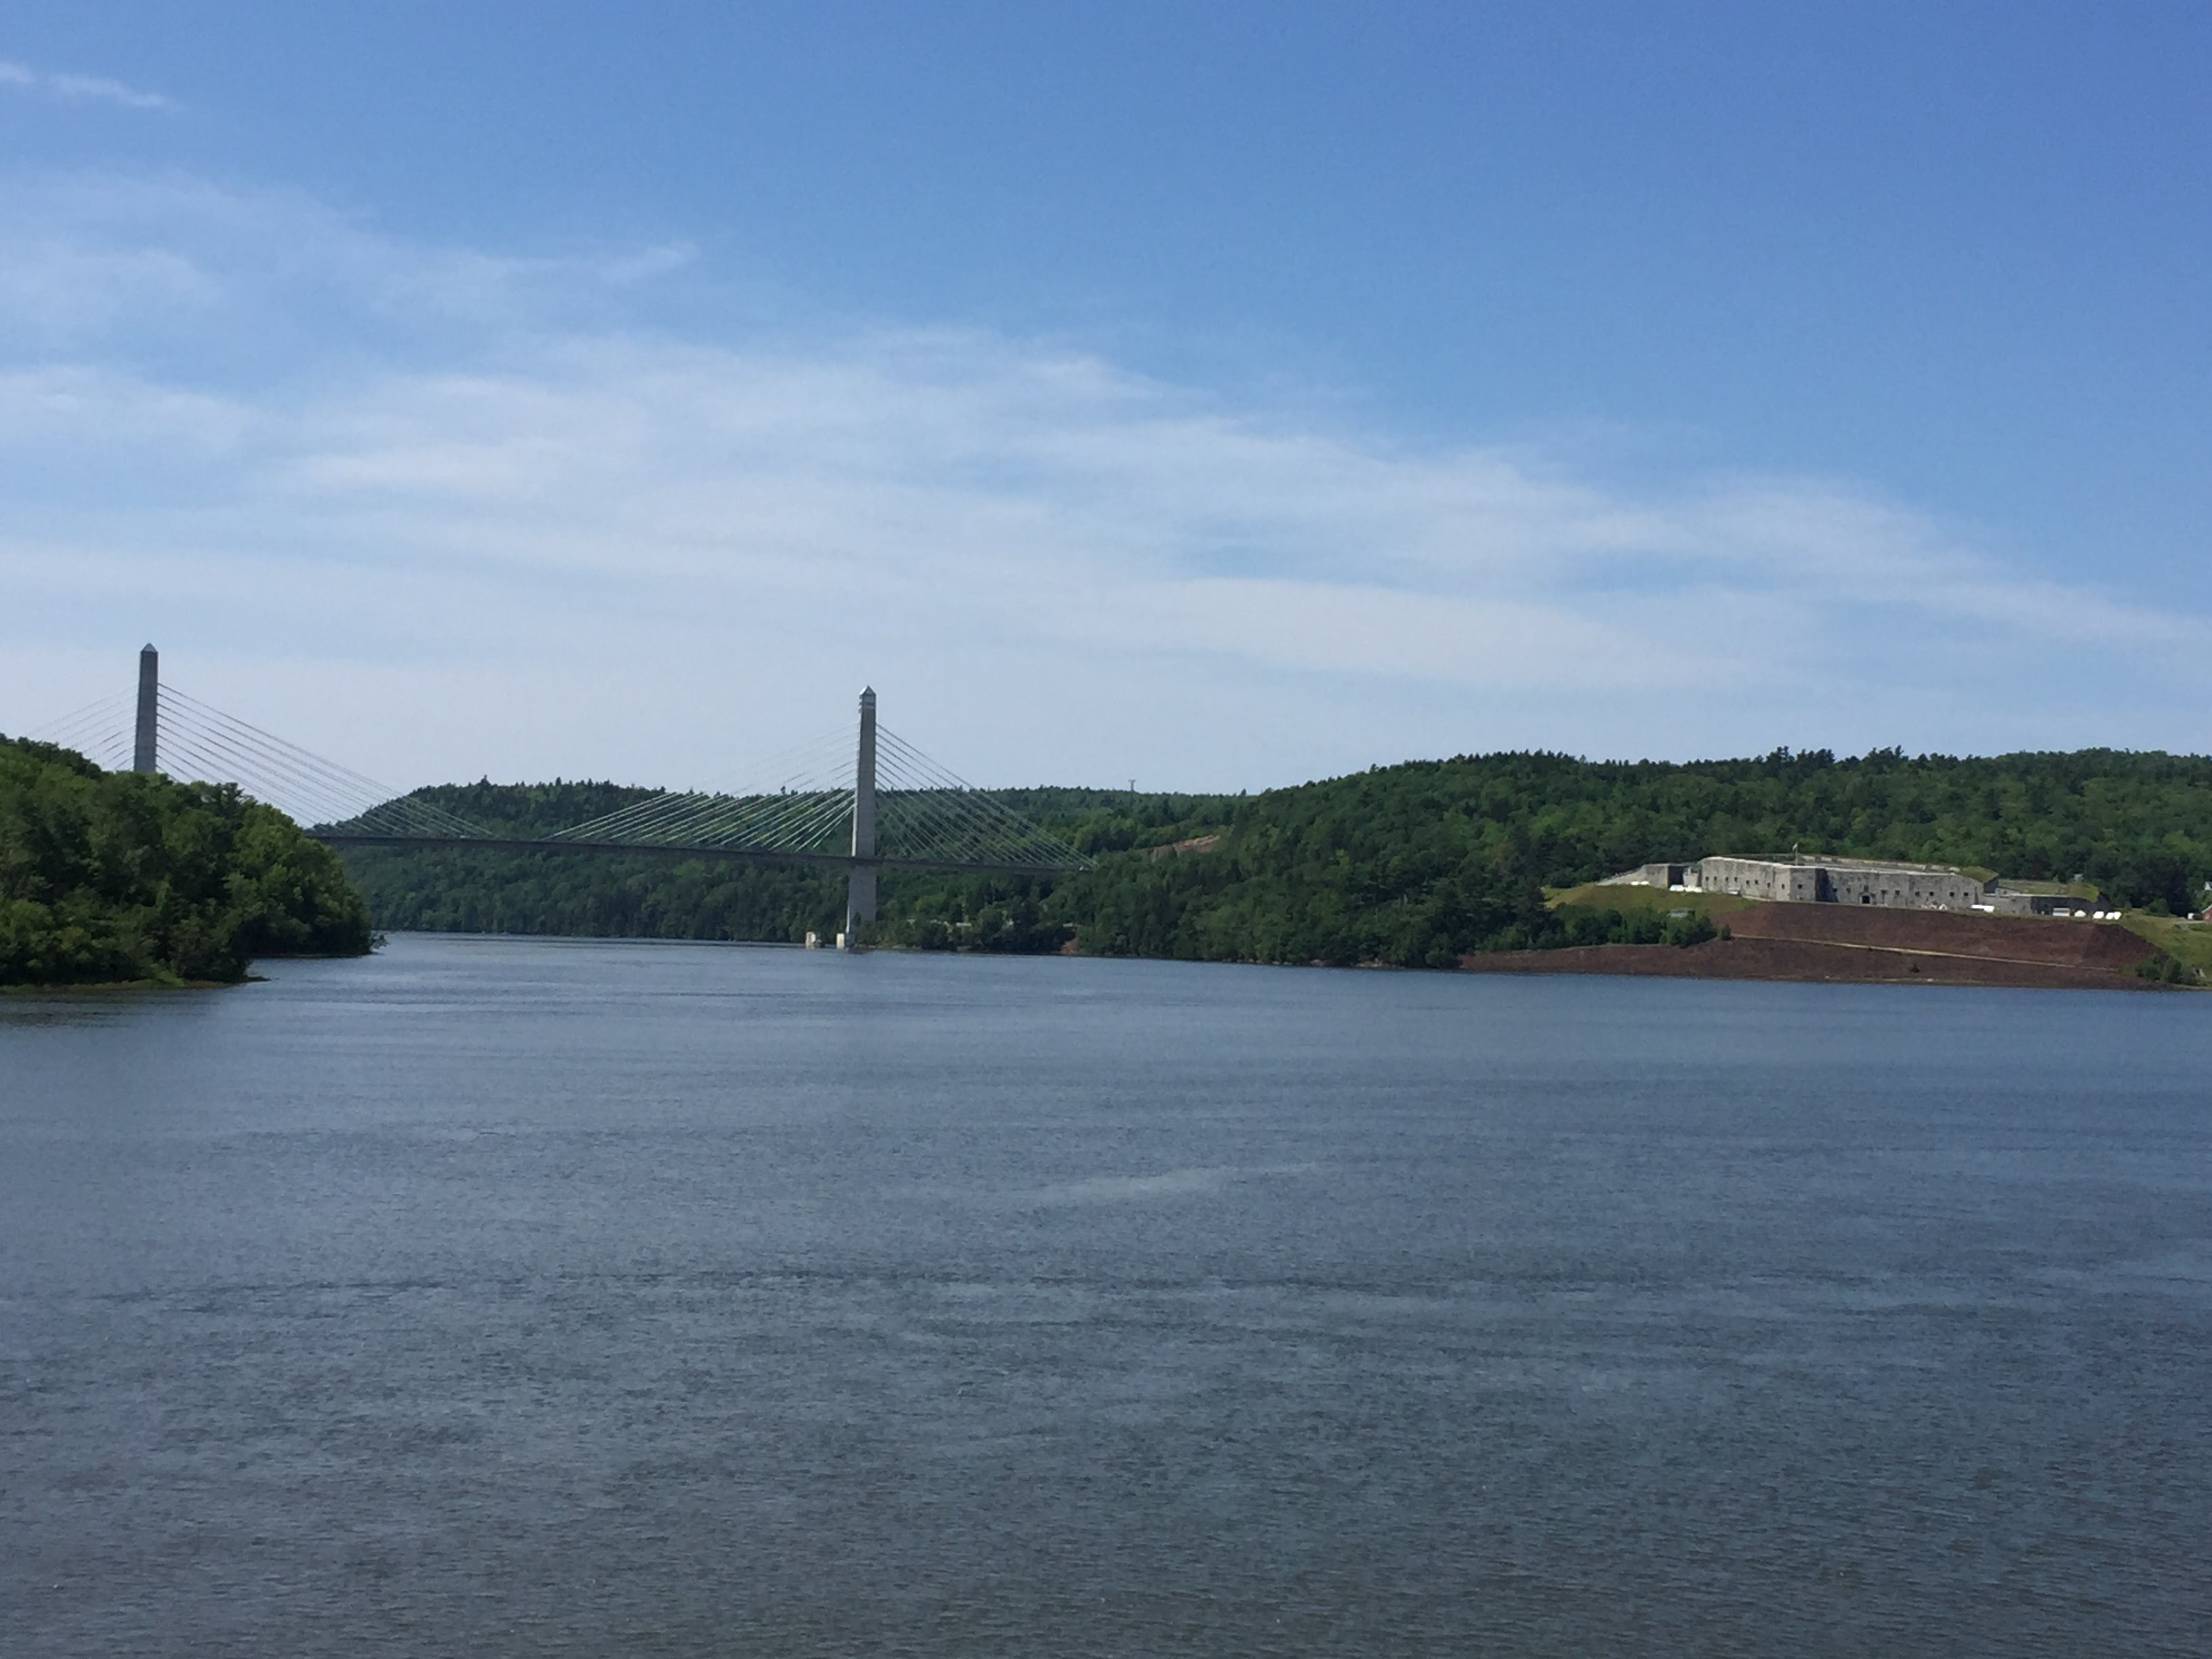 2017-07-22 Bucksport 02 - Bridge and Fort